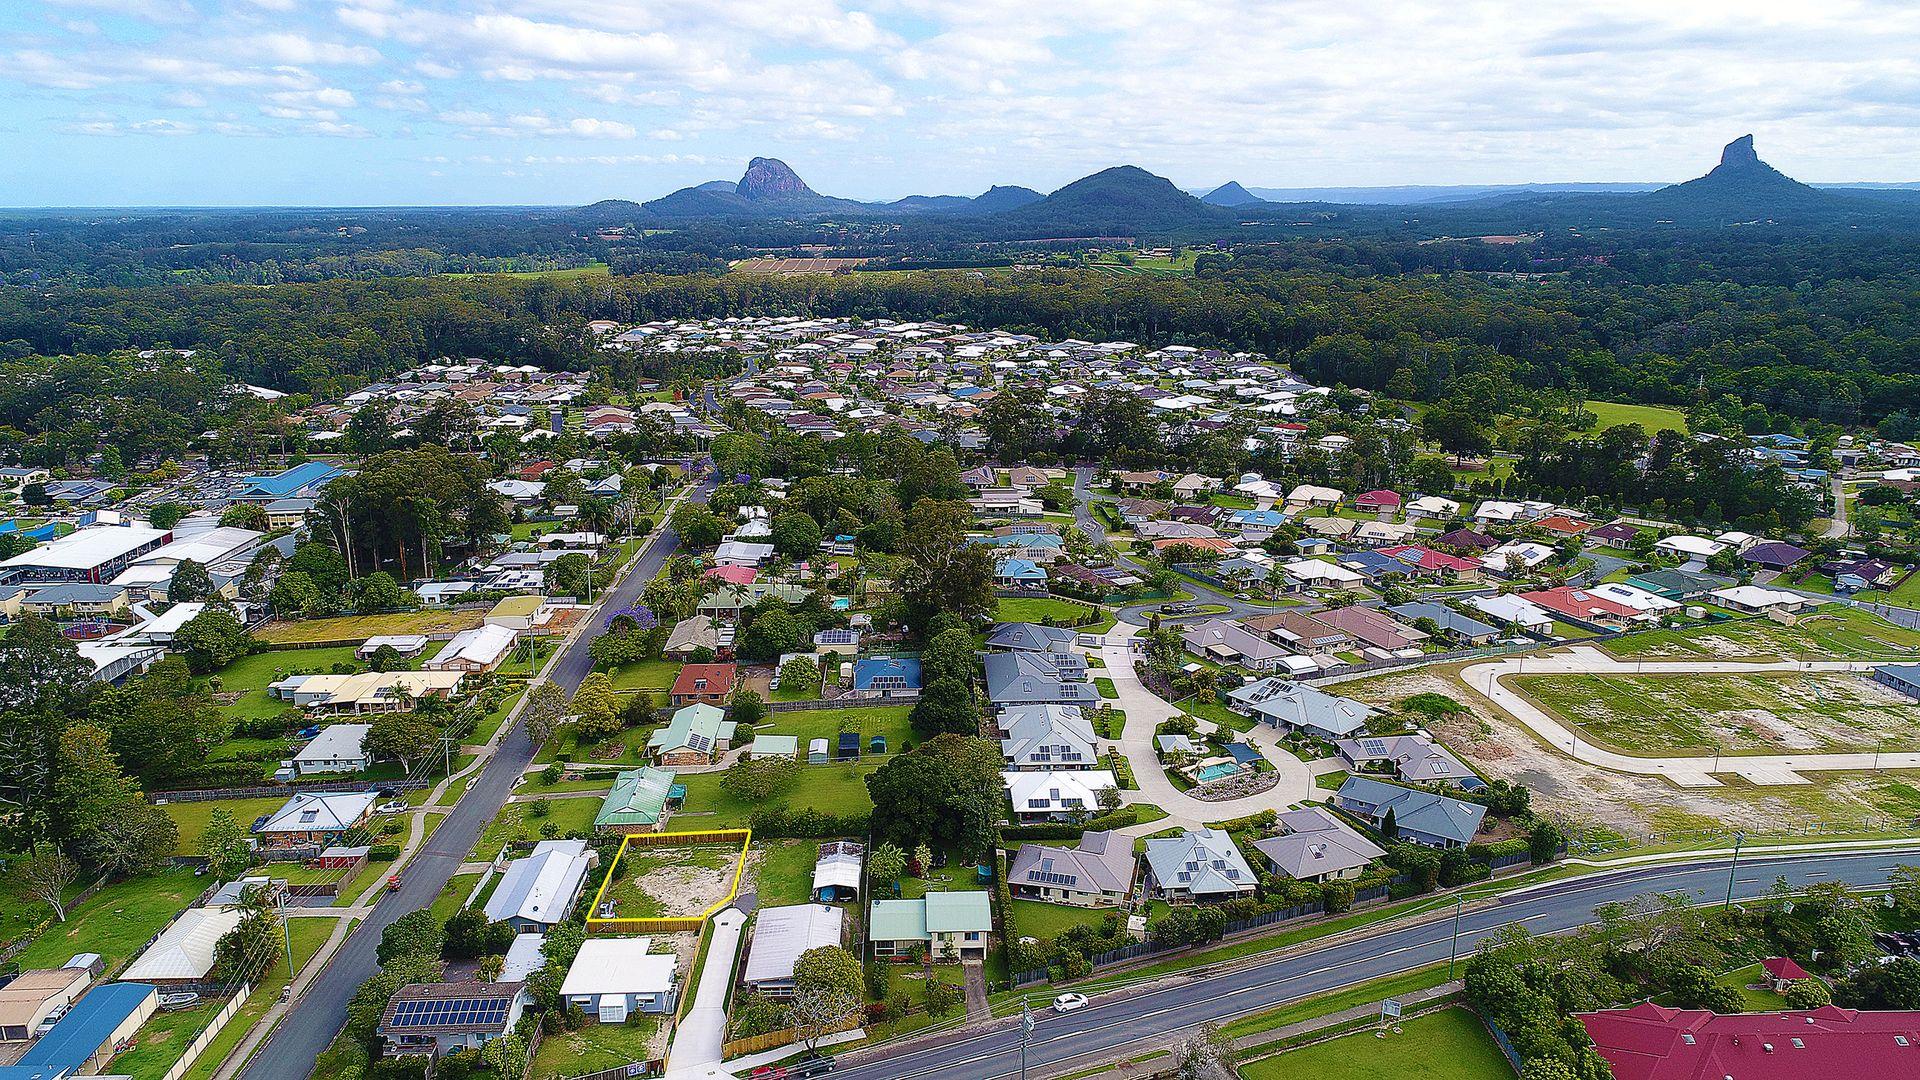 Lot 2/75 Peachester Road, Beerwah QLD 4519, Image 1